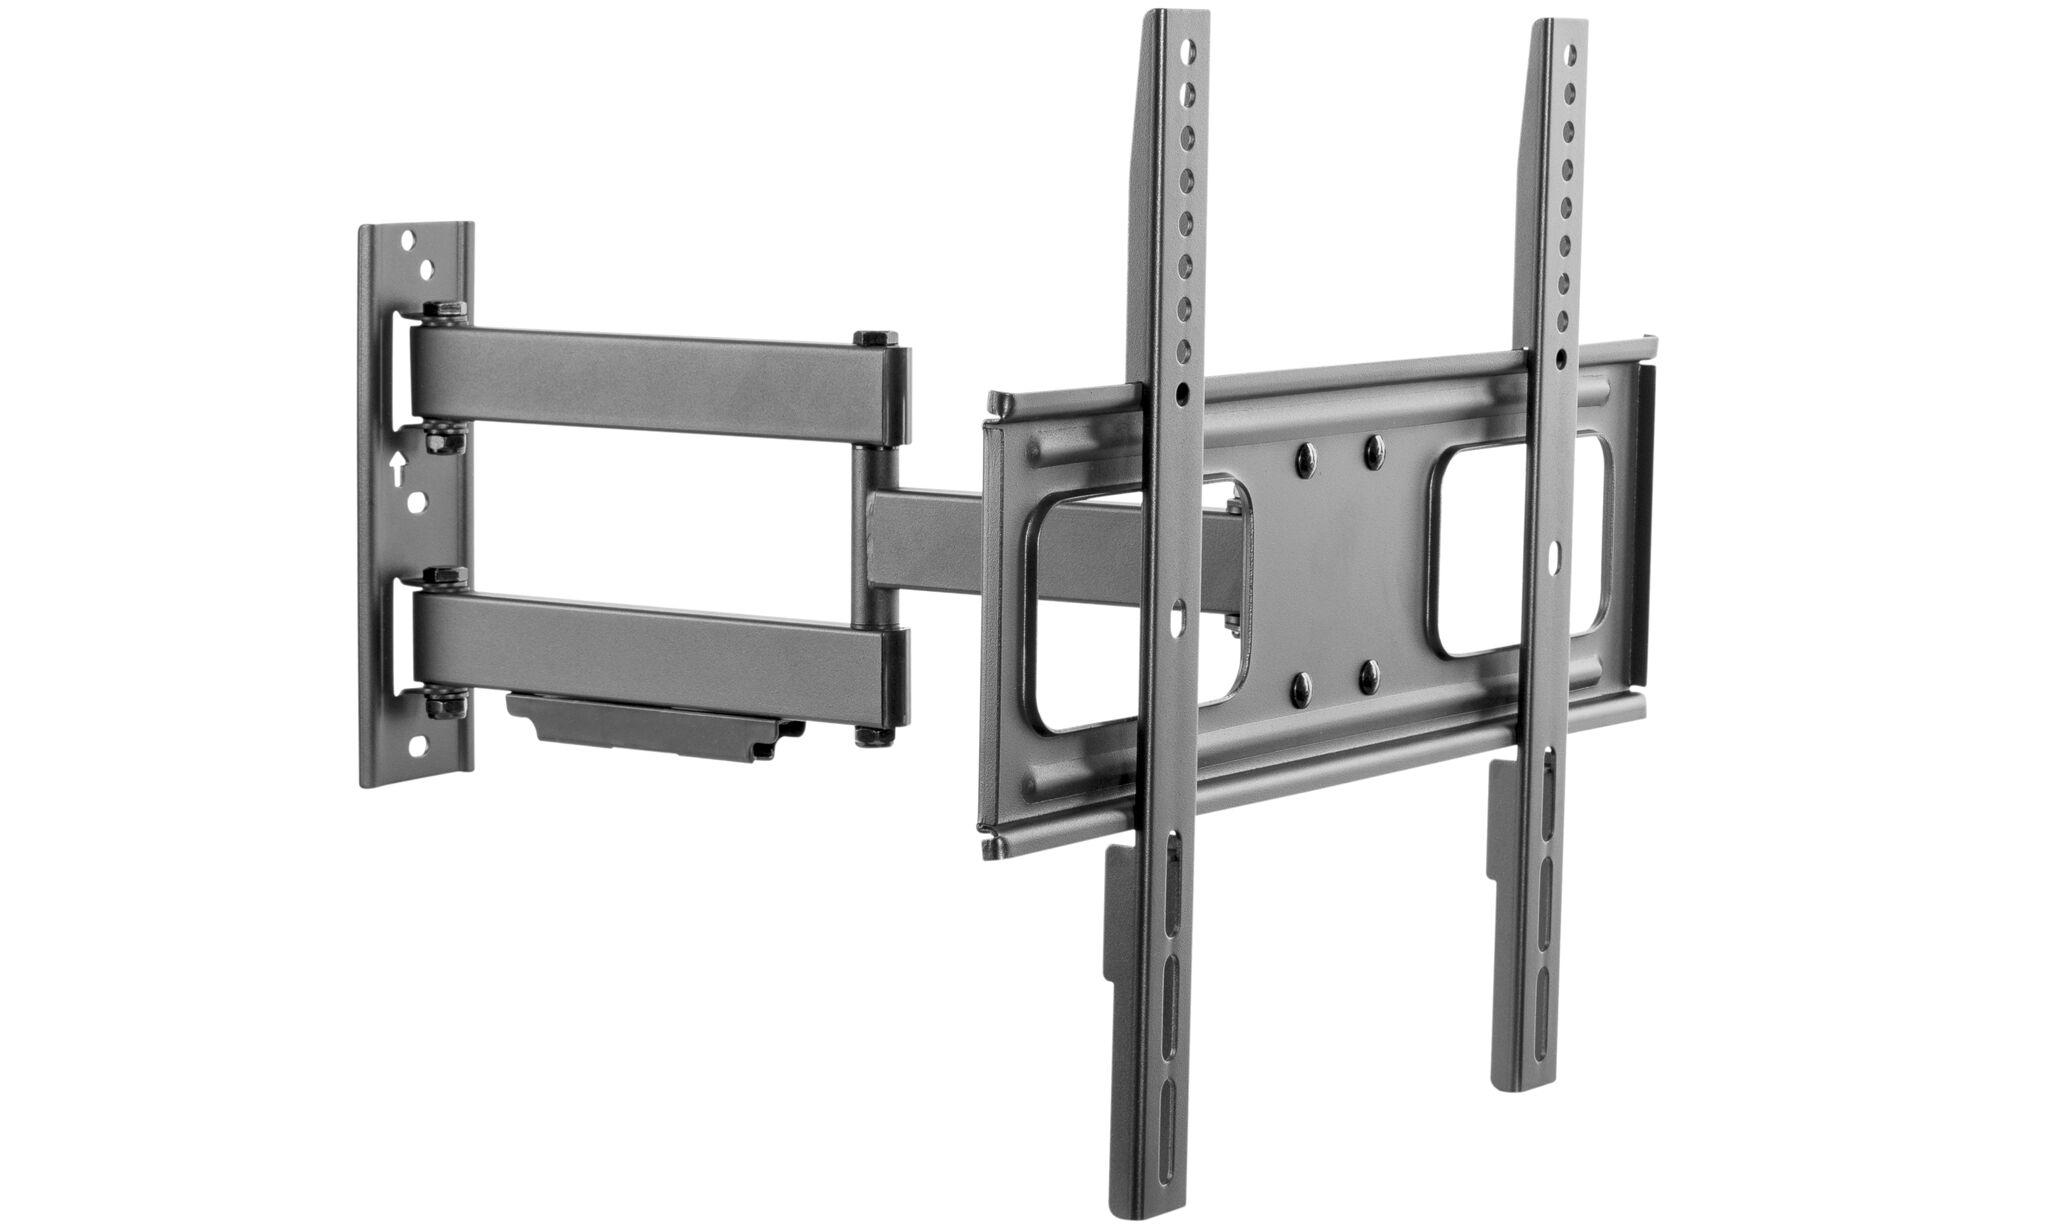 peerless full service thin video wall mount